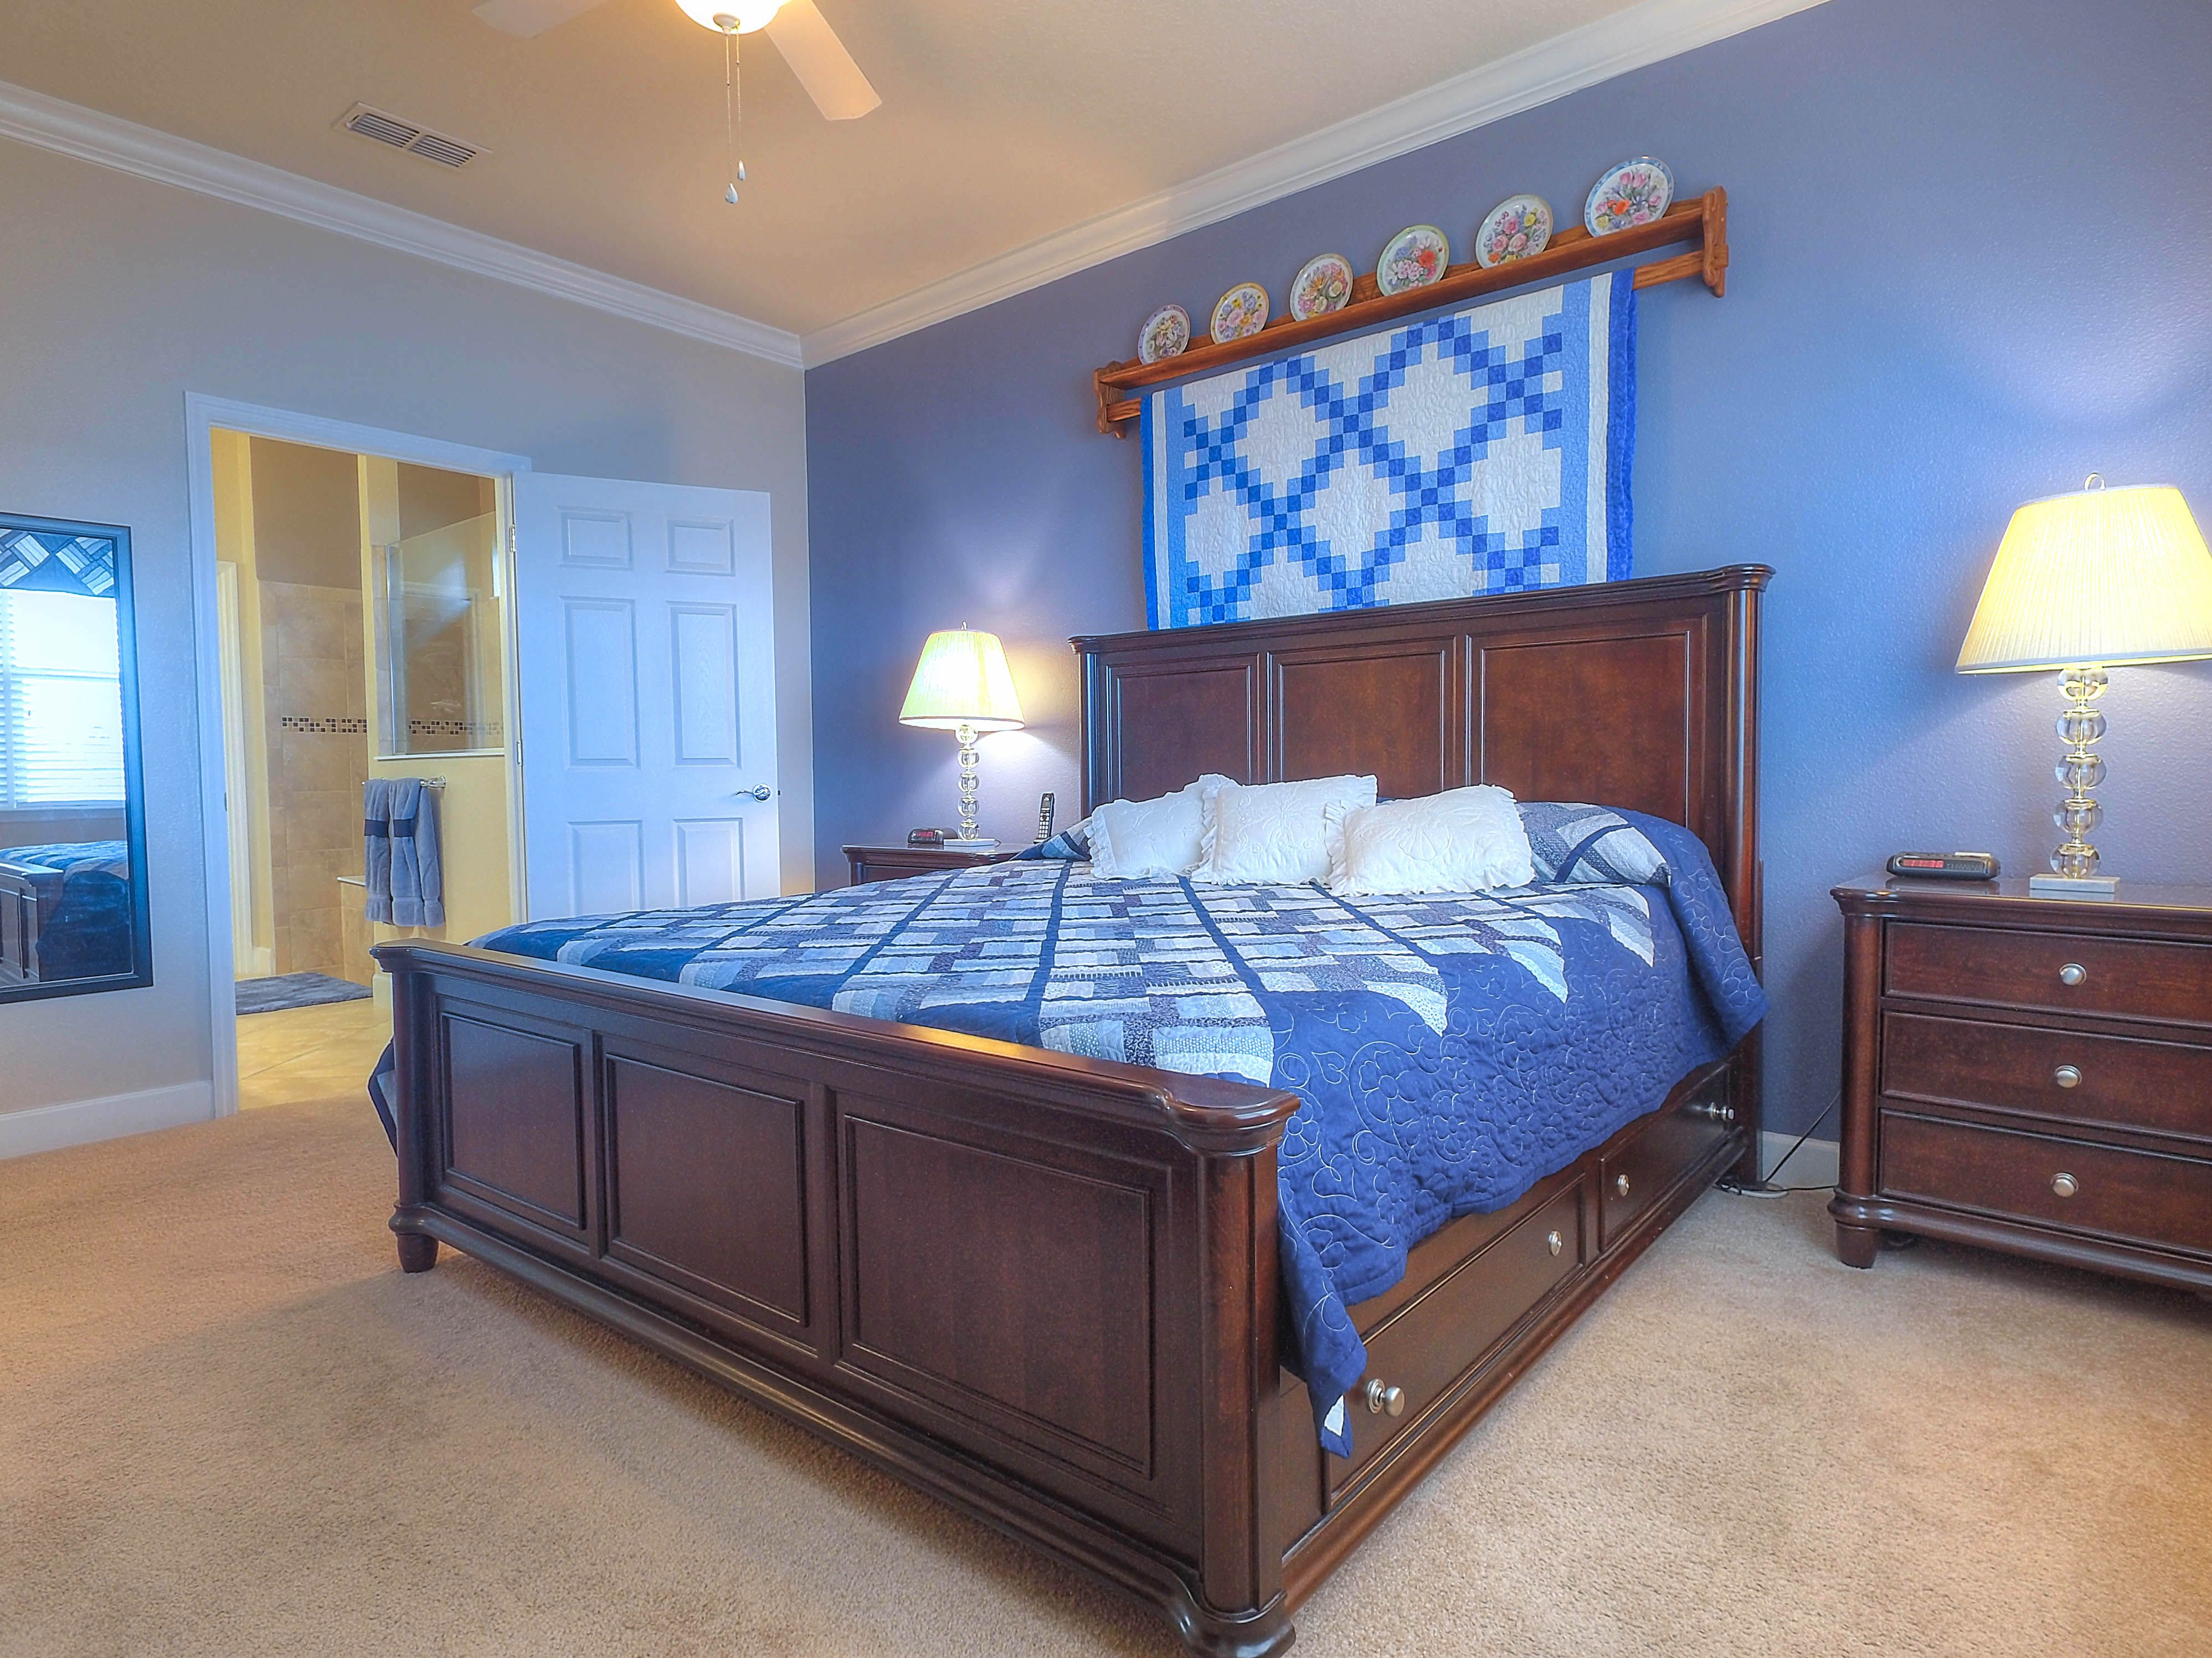 Master bedroom ensuite  Image result for master bedroom ensuite that includes closet